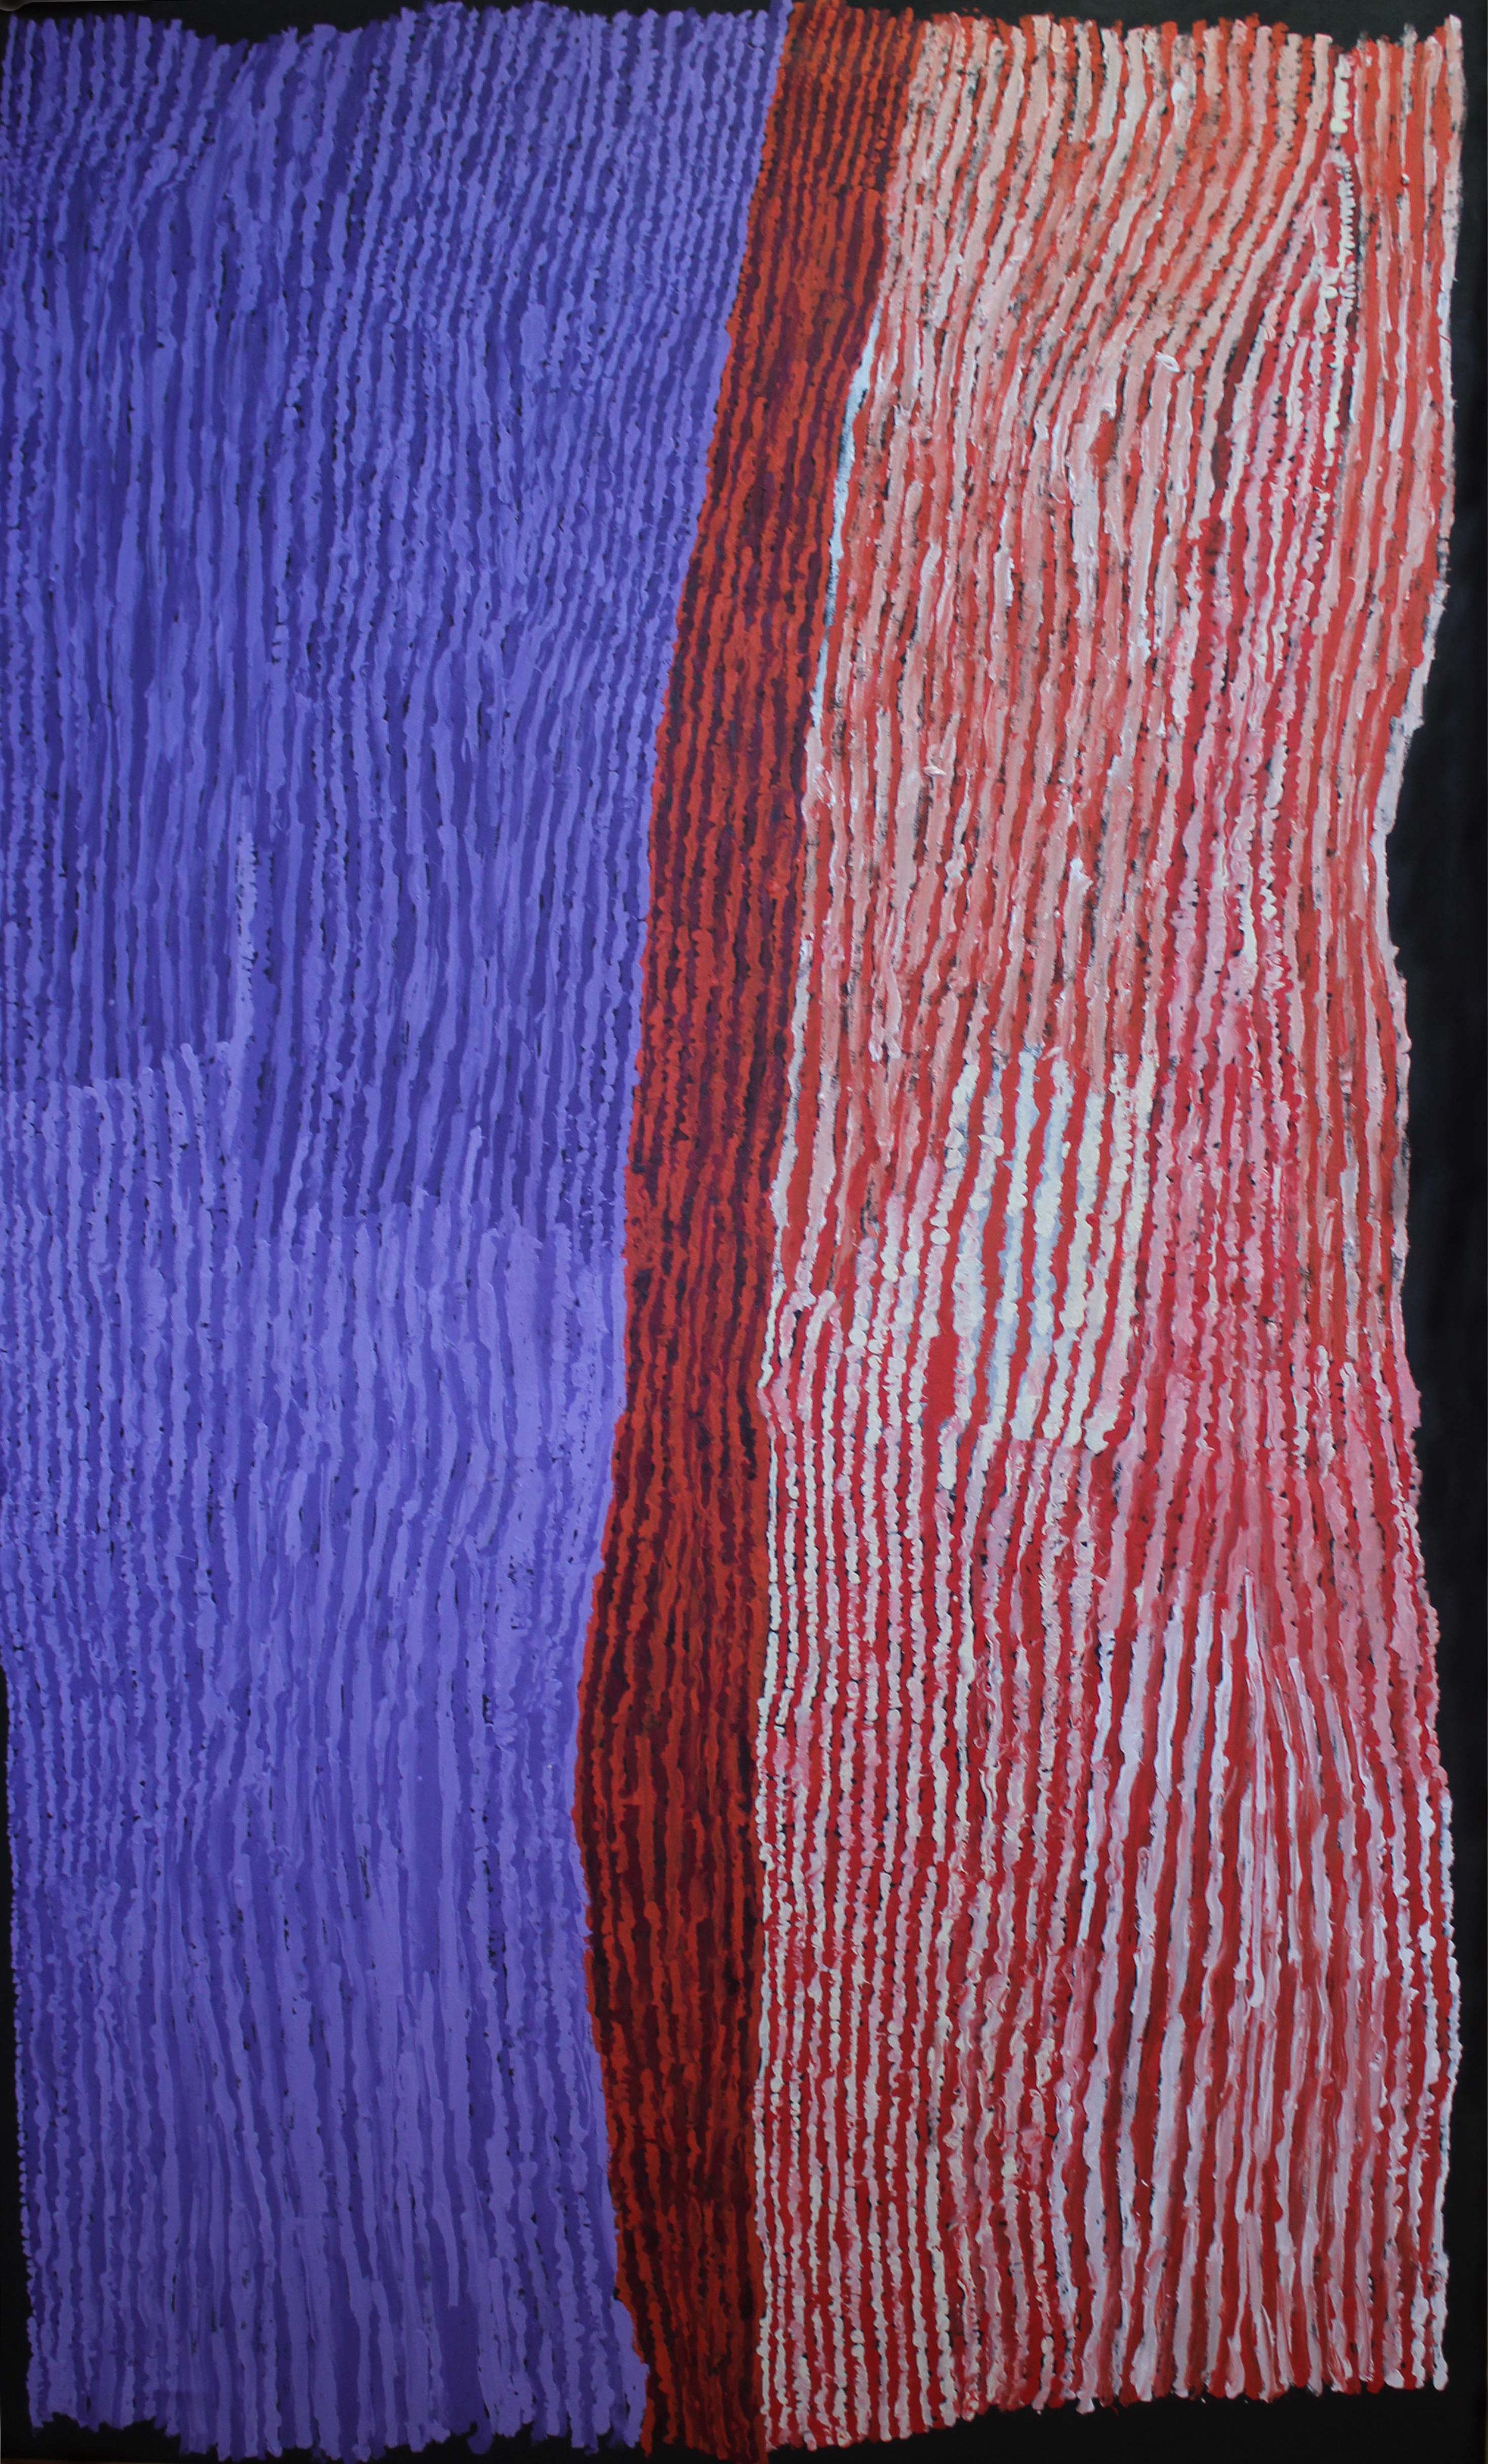 "Ray Ken  Tali - Sand dune  Acrylic on linen 78"" x 48"" (198 x 122 cm) Tjala Arts Catalog #394-16   EMAIL INQUIRY"